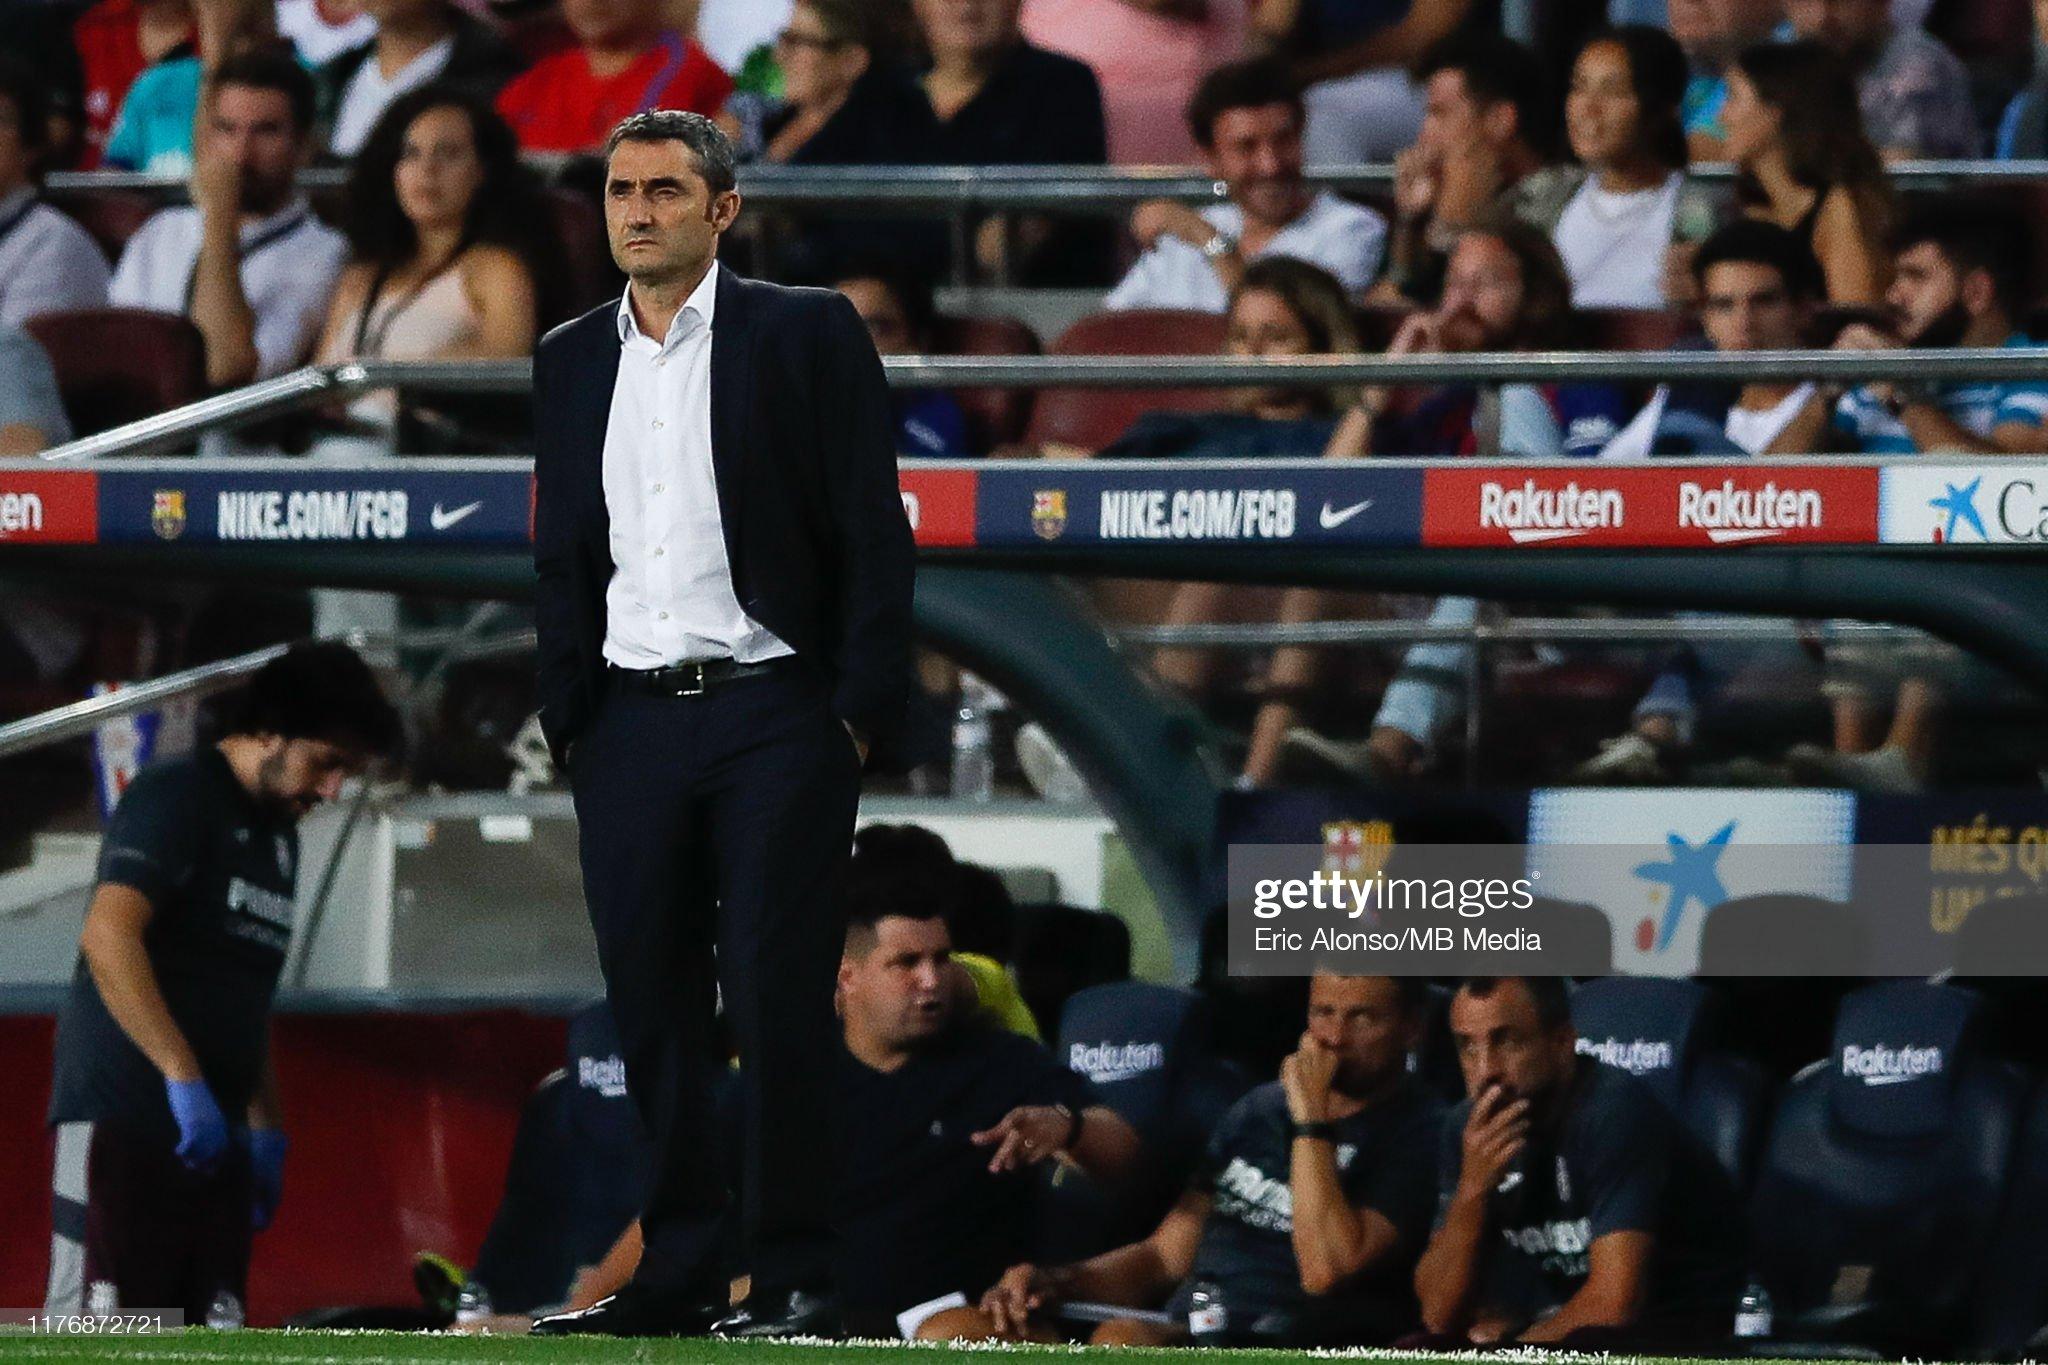 صور مباراة : برشلونة - فياريال 2-1 ( 24-09-2019 )  Ernesto-valverde-of-fc-barcelona-looks-on-during-the-liga-match-fc-picture-id1176872721?s=2048x2048